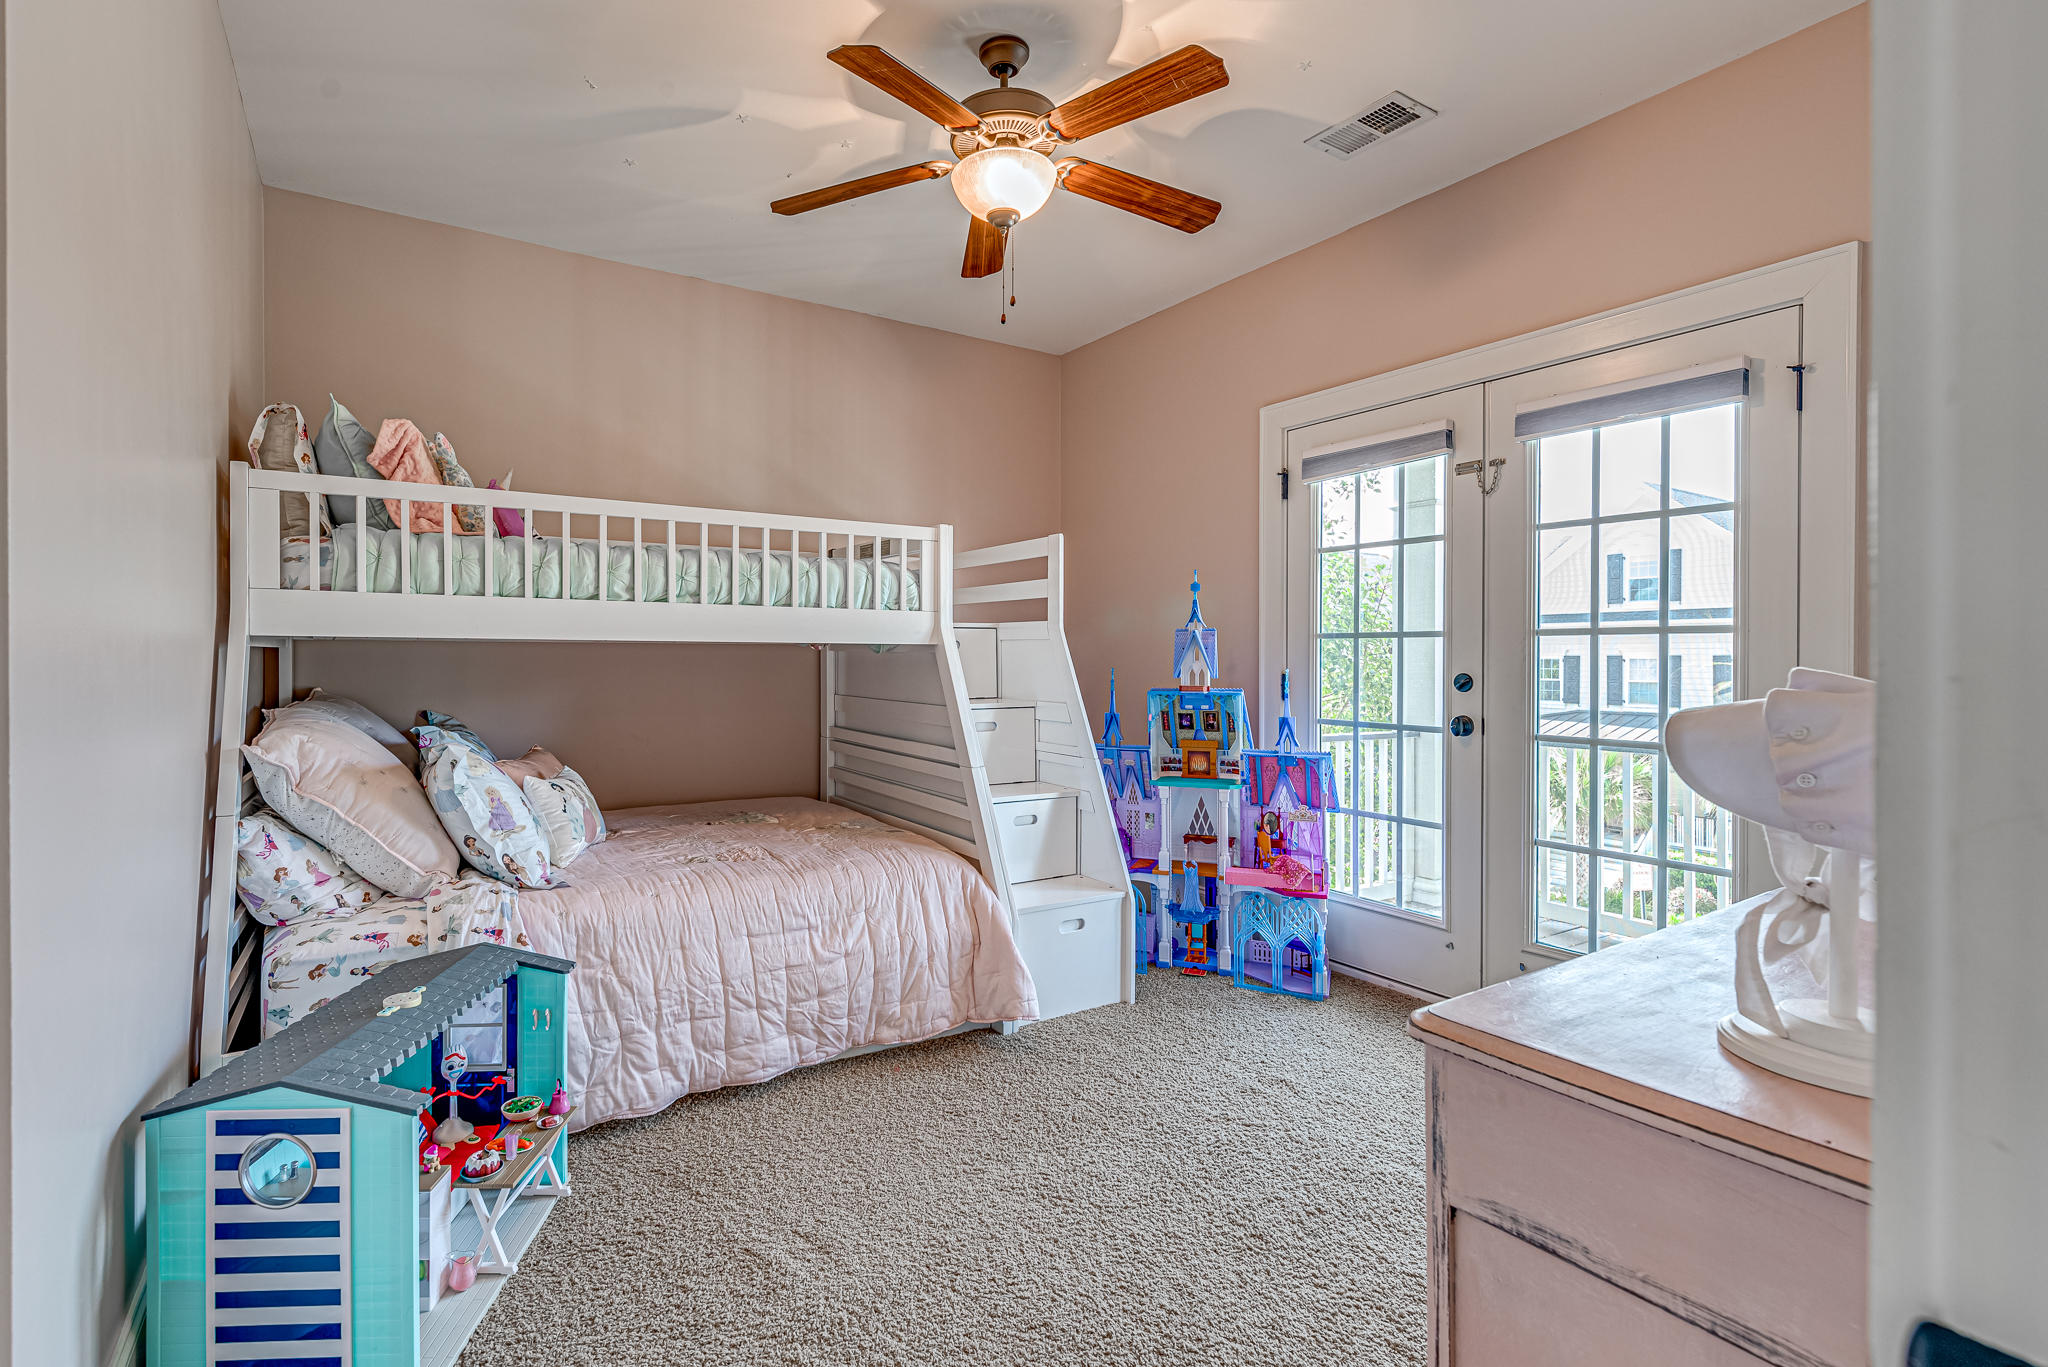 Daniel Island Smythe Park Homes For Sale - 1410 Wando View, Charleston, SC - 52